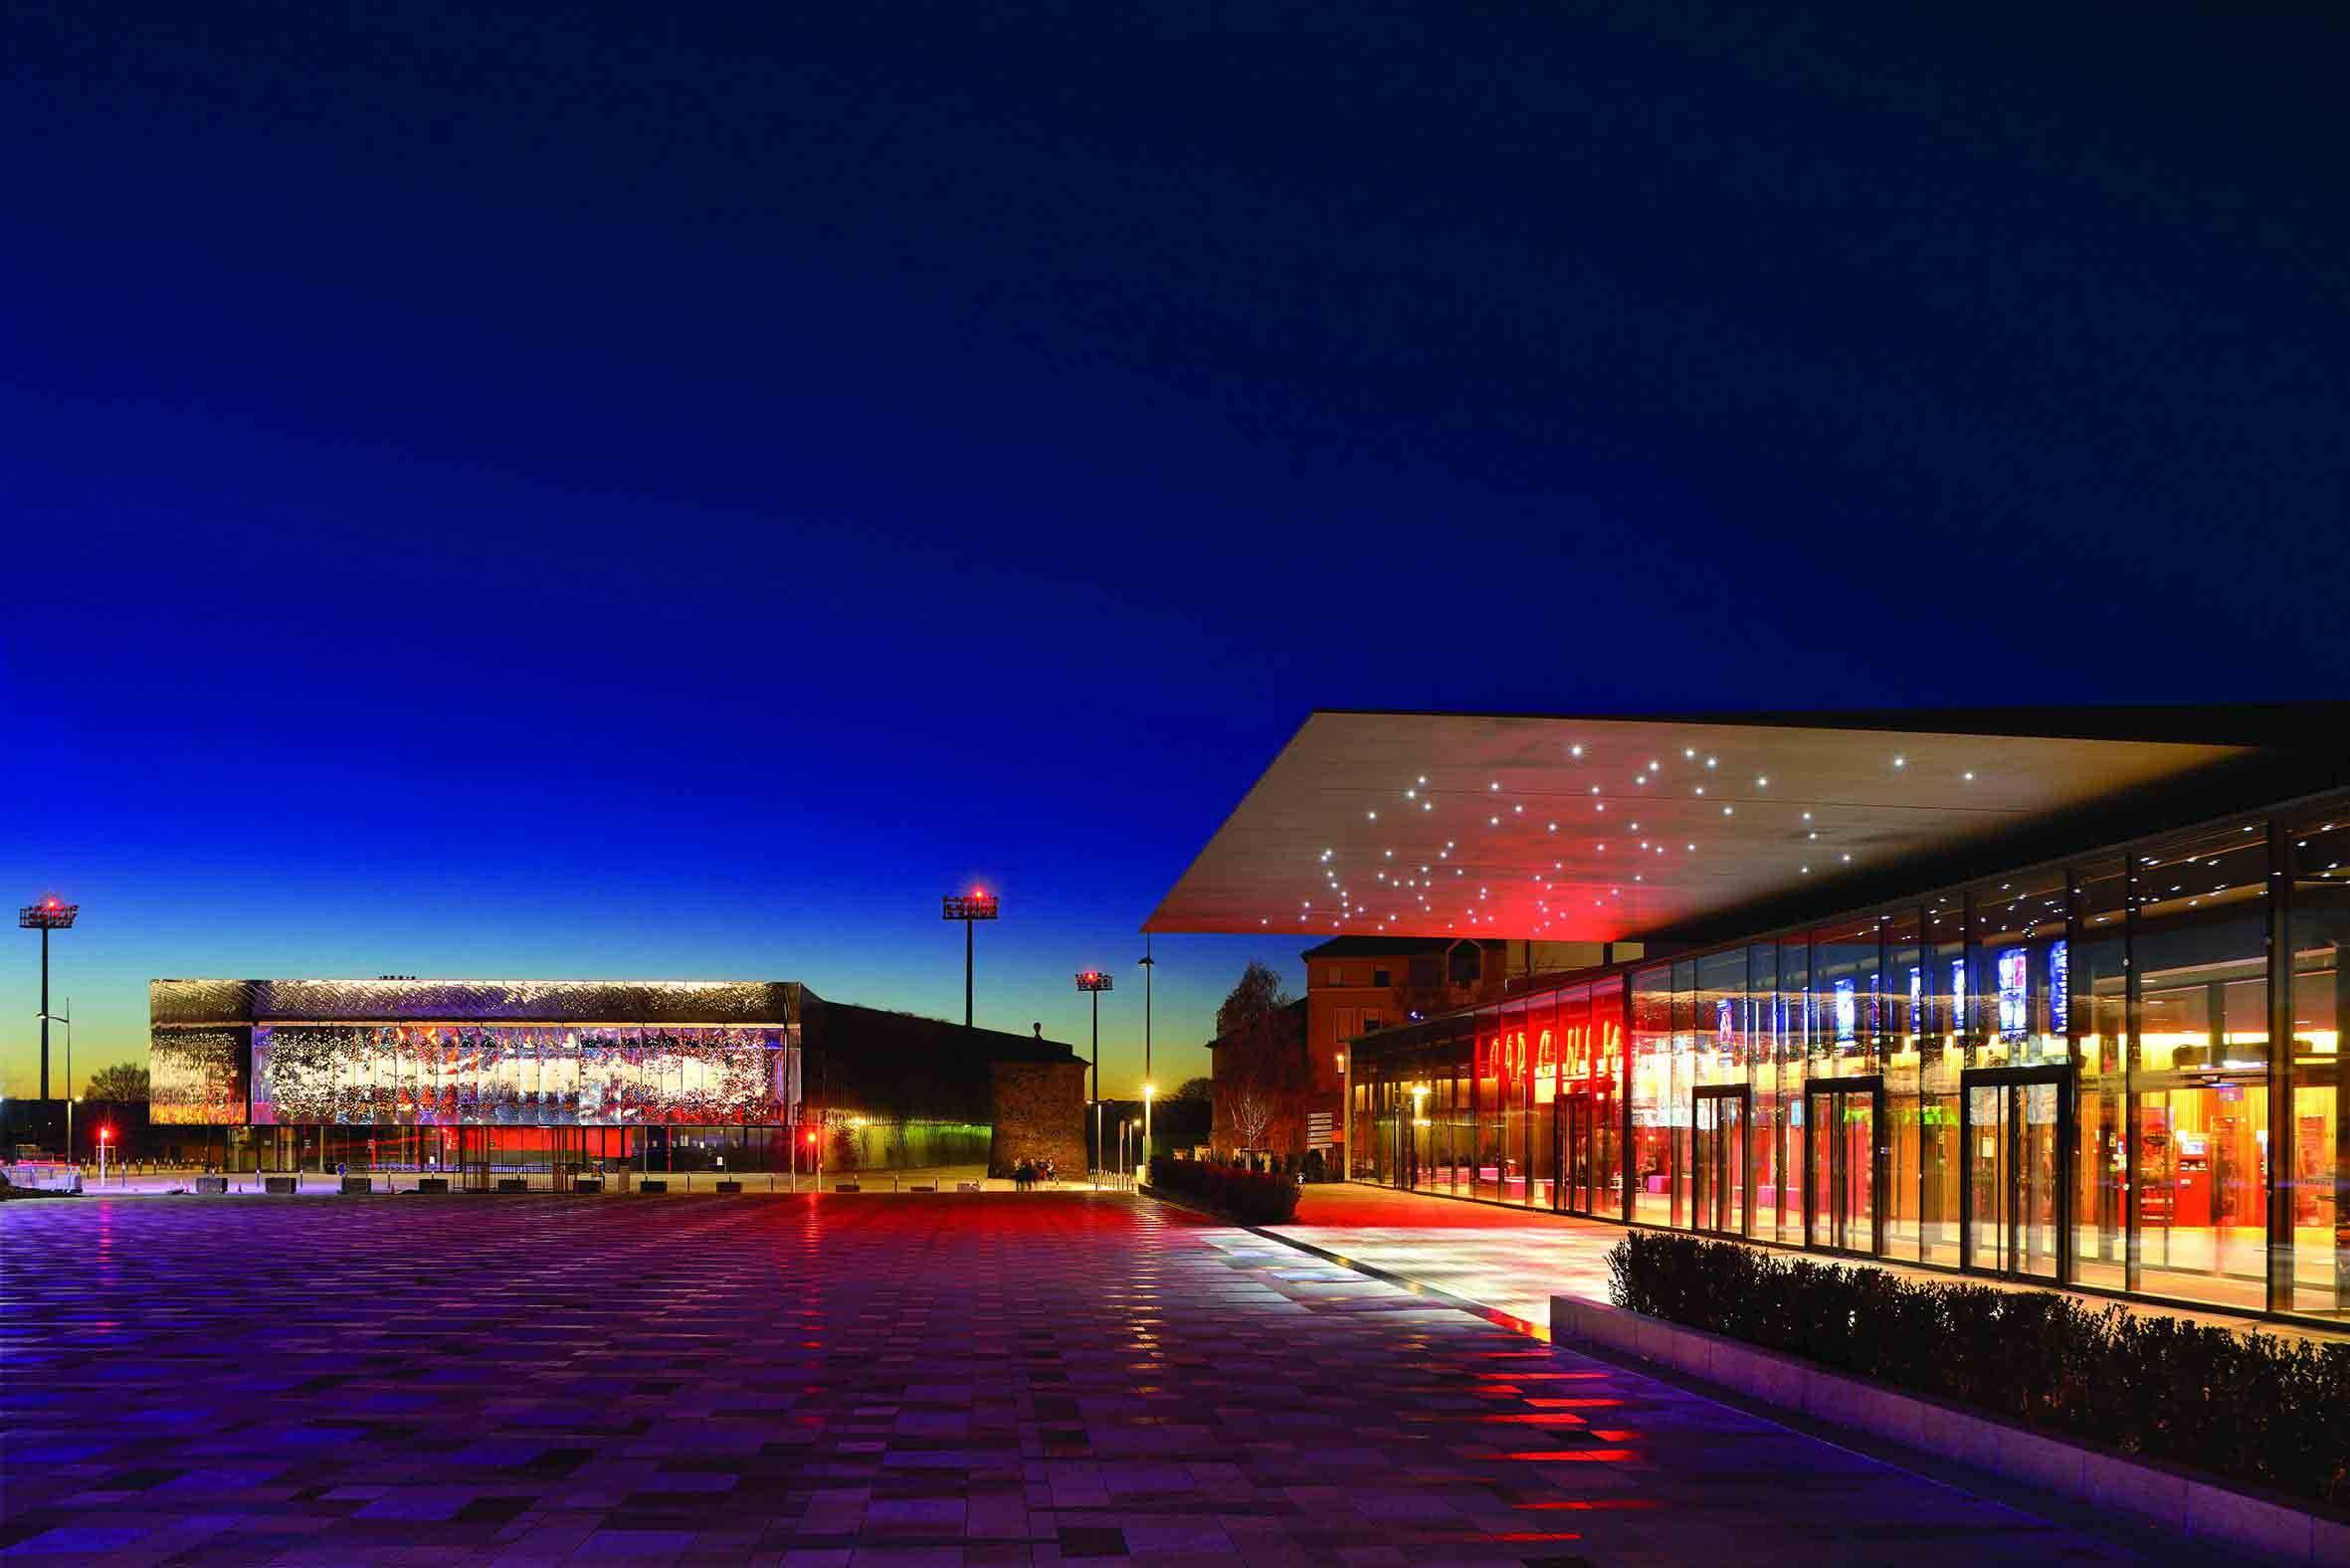 Ductal uhpc 法国罗德兹复合电影院屋面解决方案